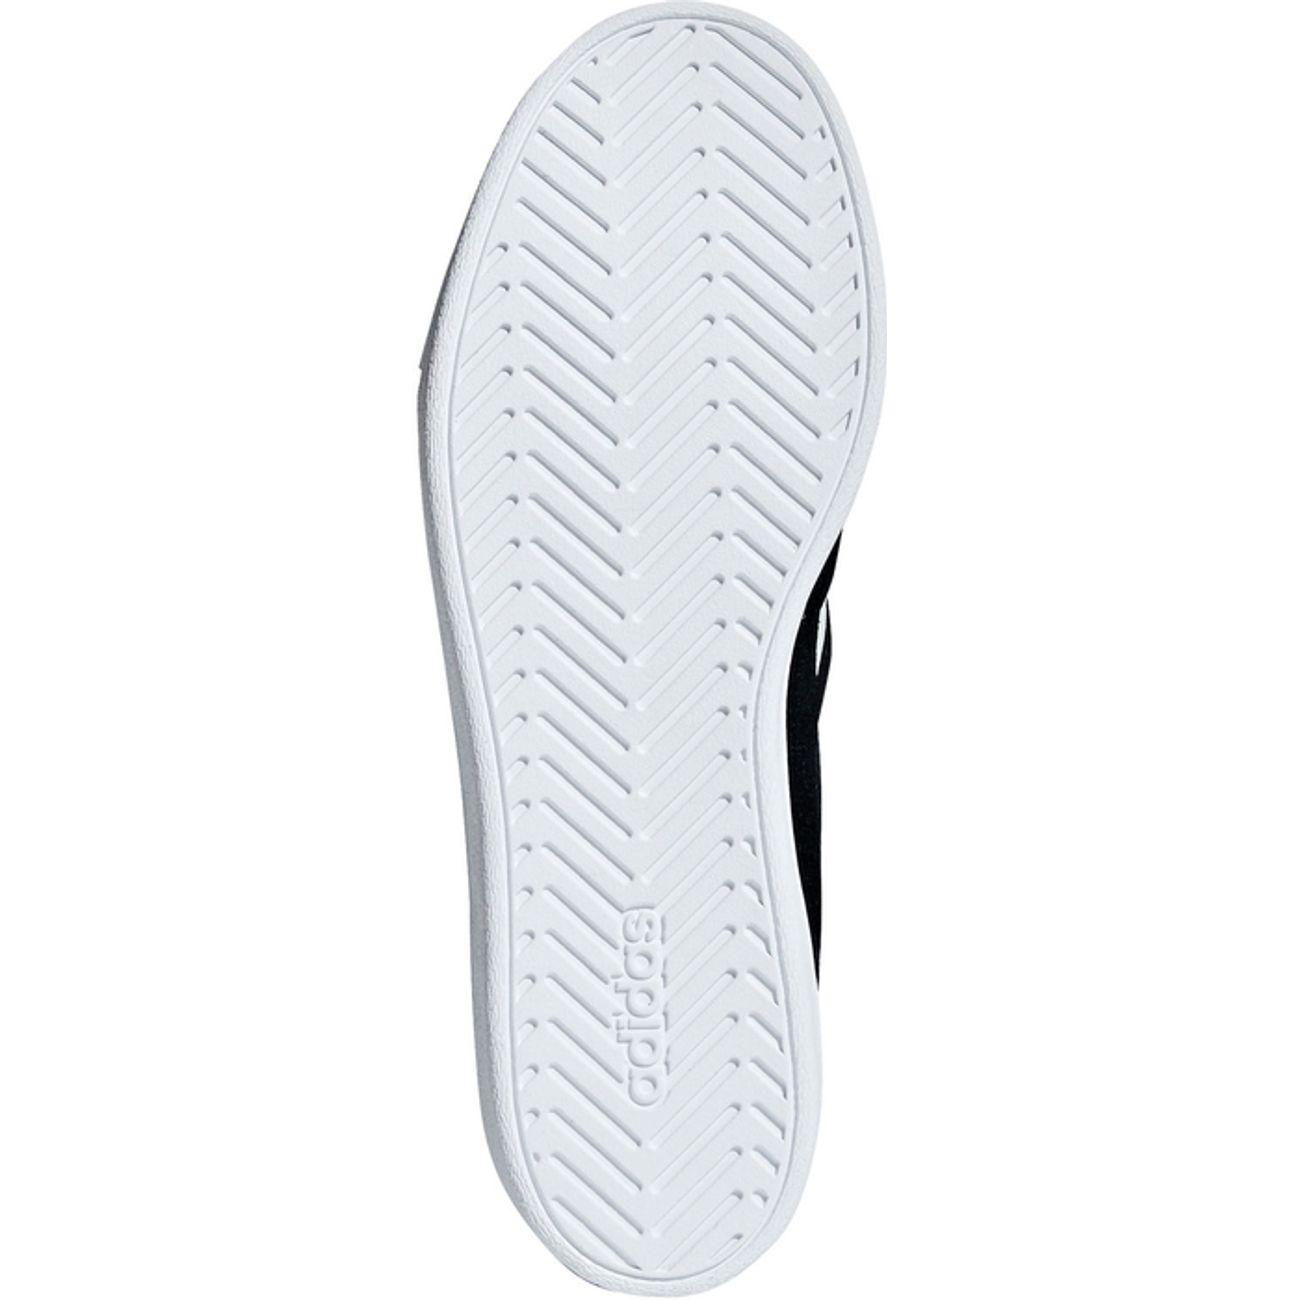 Court70s Chaussures Basses Adidas Tennis DoublureTextile Composition Homme 08nOXkwP